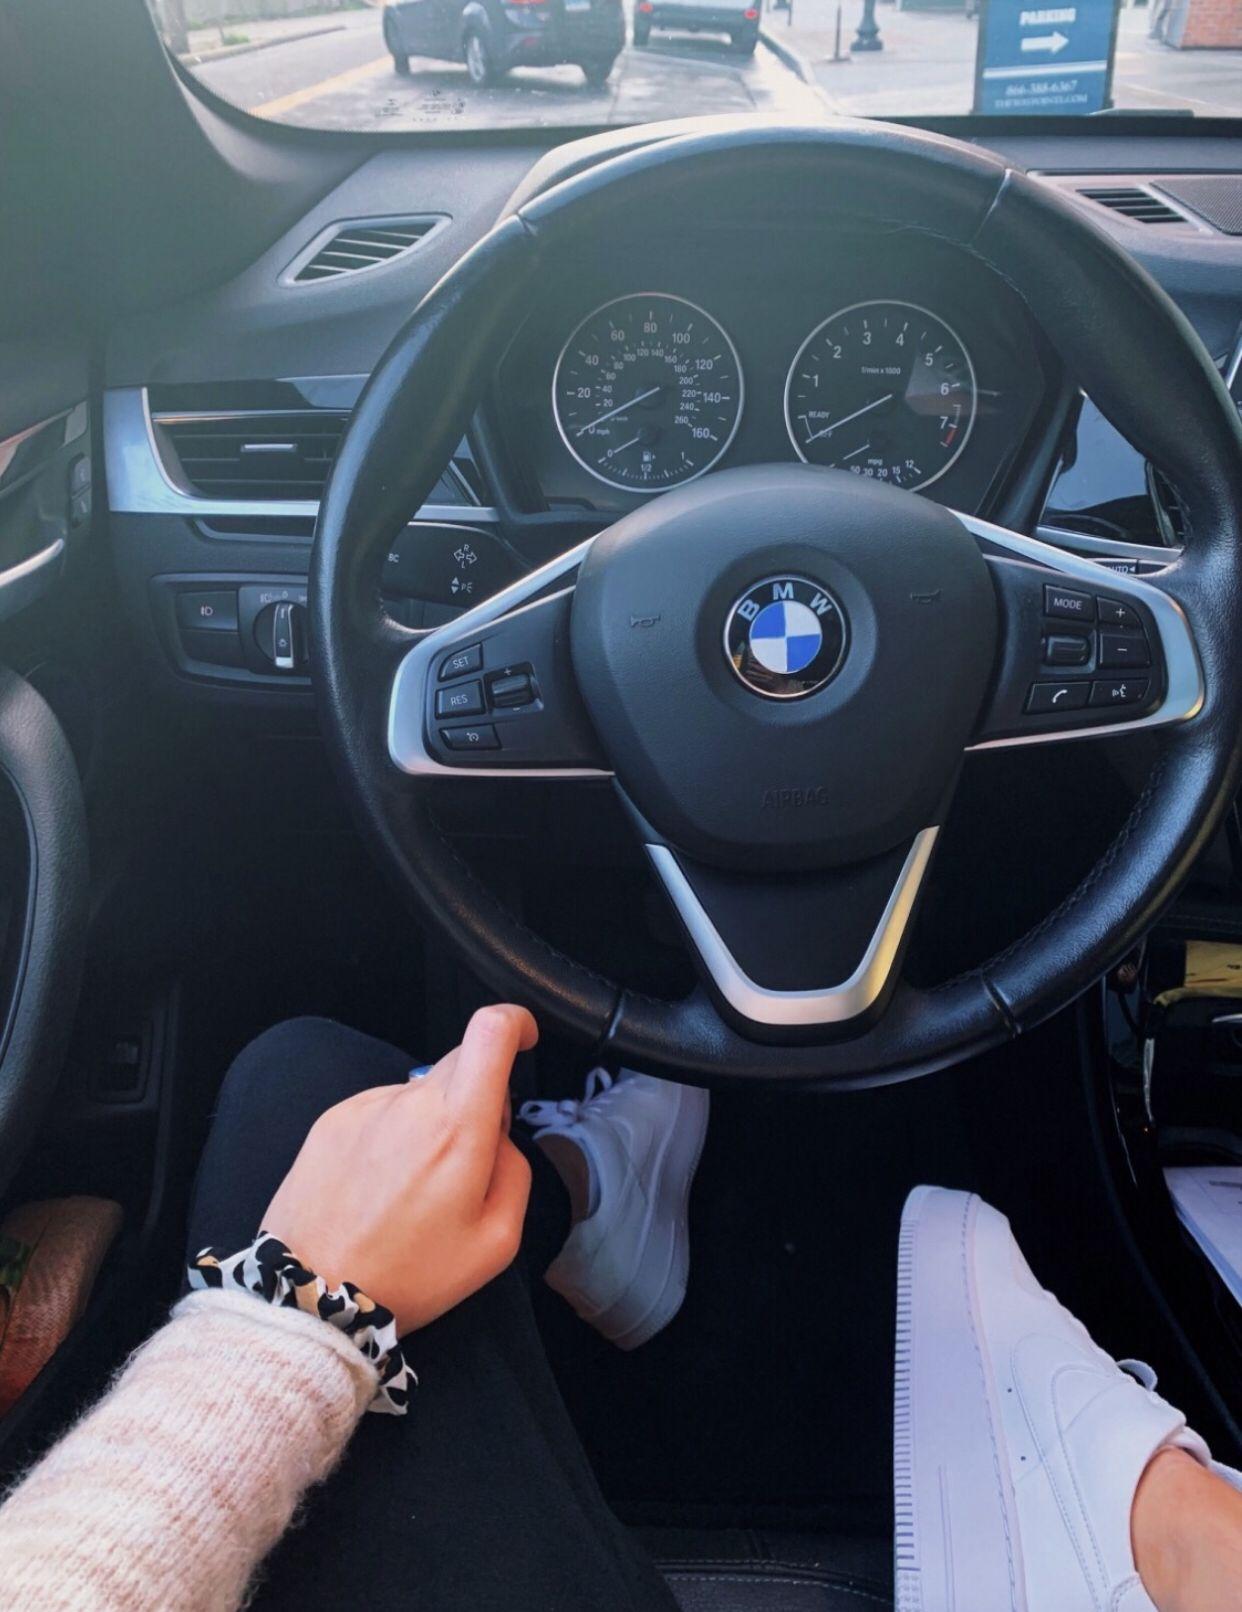 Vsco Chynapmcghee In 2020 Bmw Girl Dream Cars Girls Driving